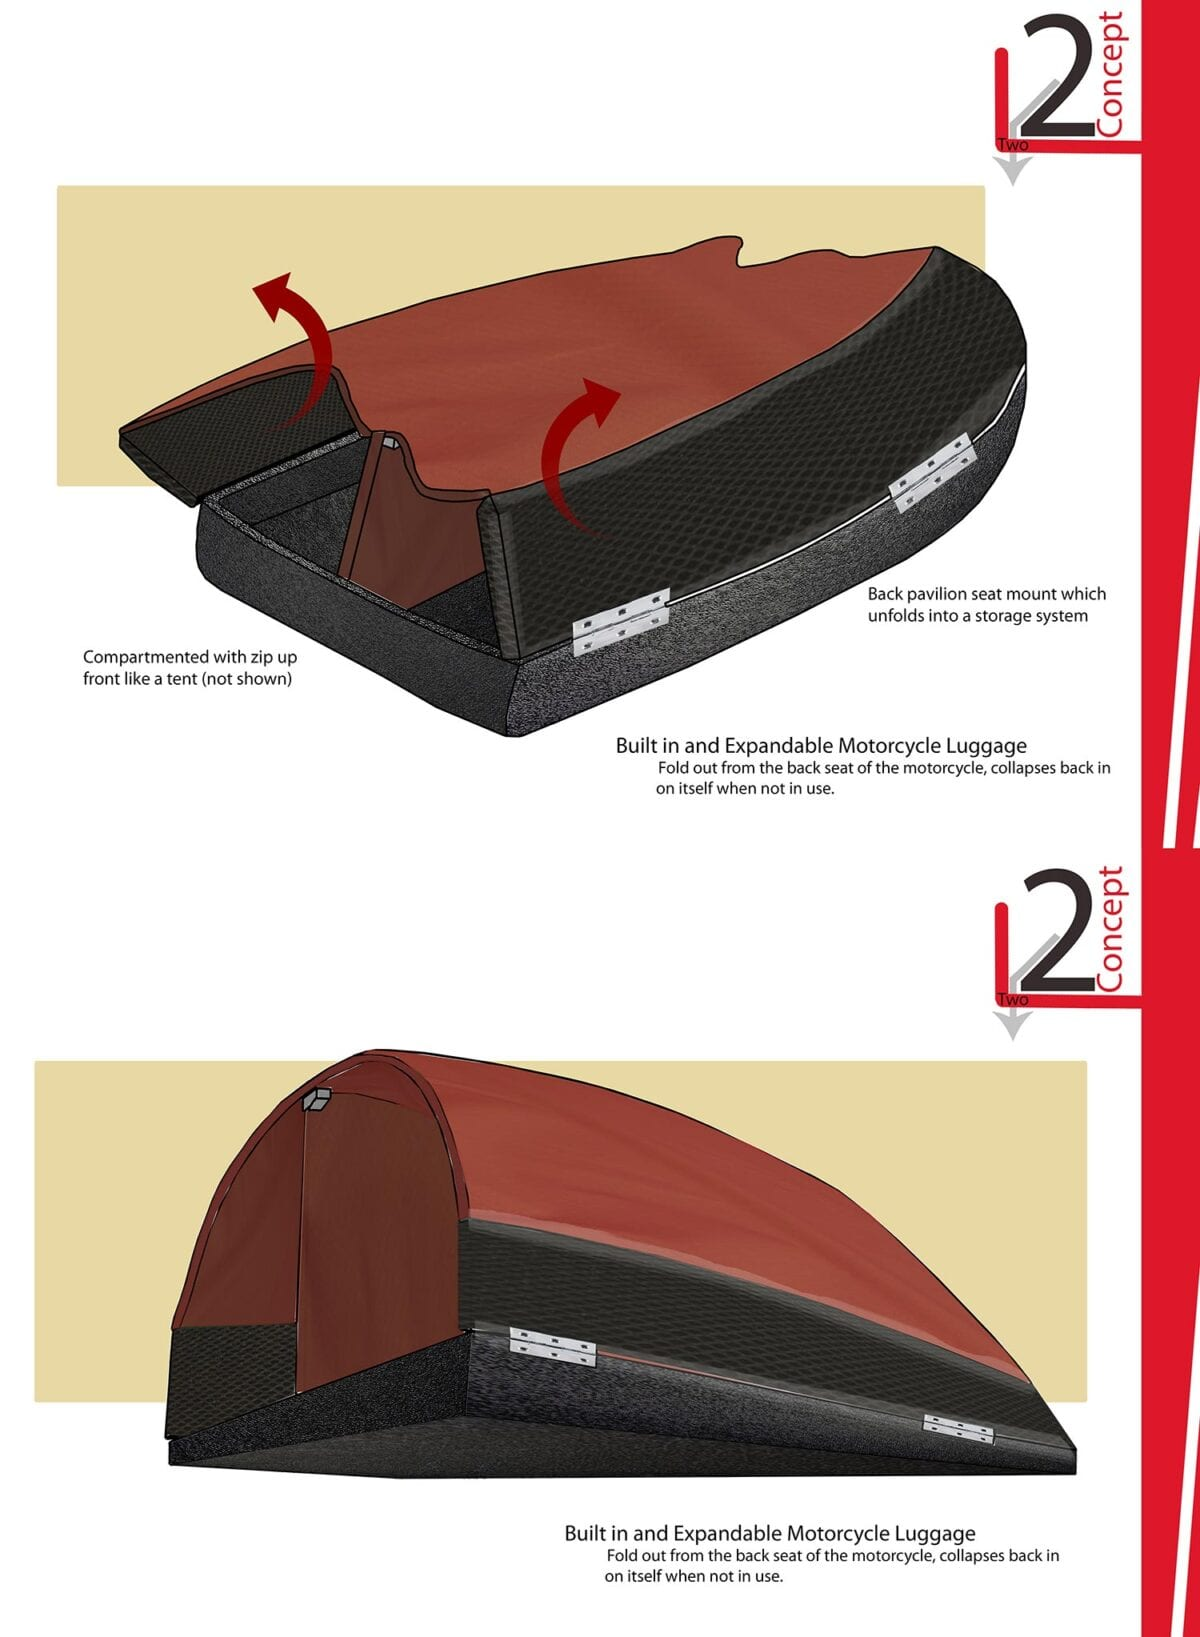 Chris-Stallwood-budget-motorcycle-luggage-002